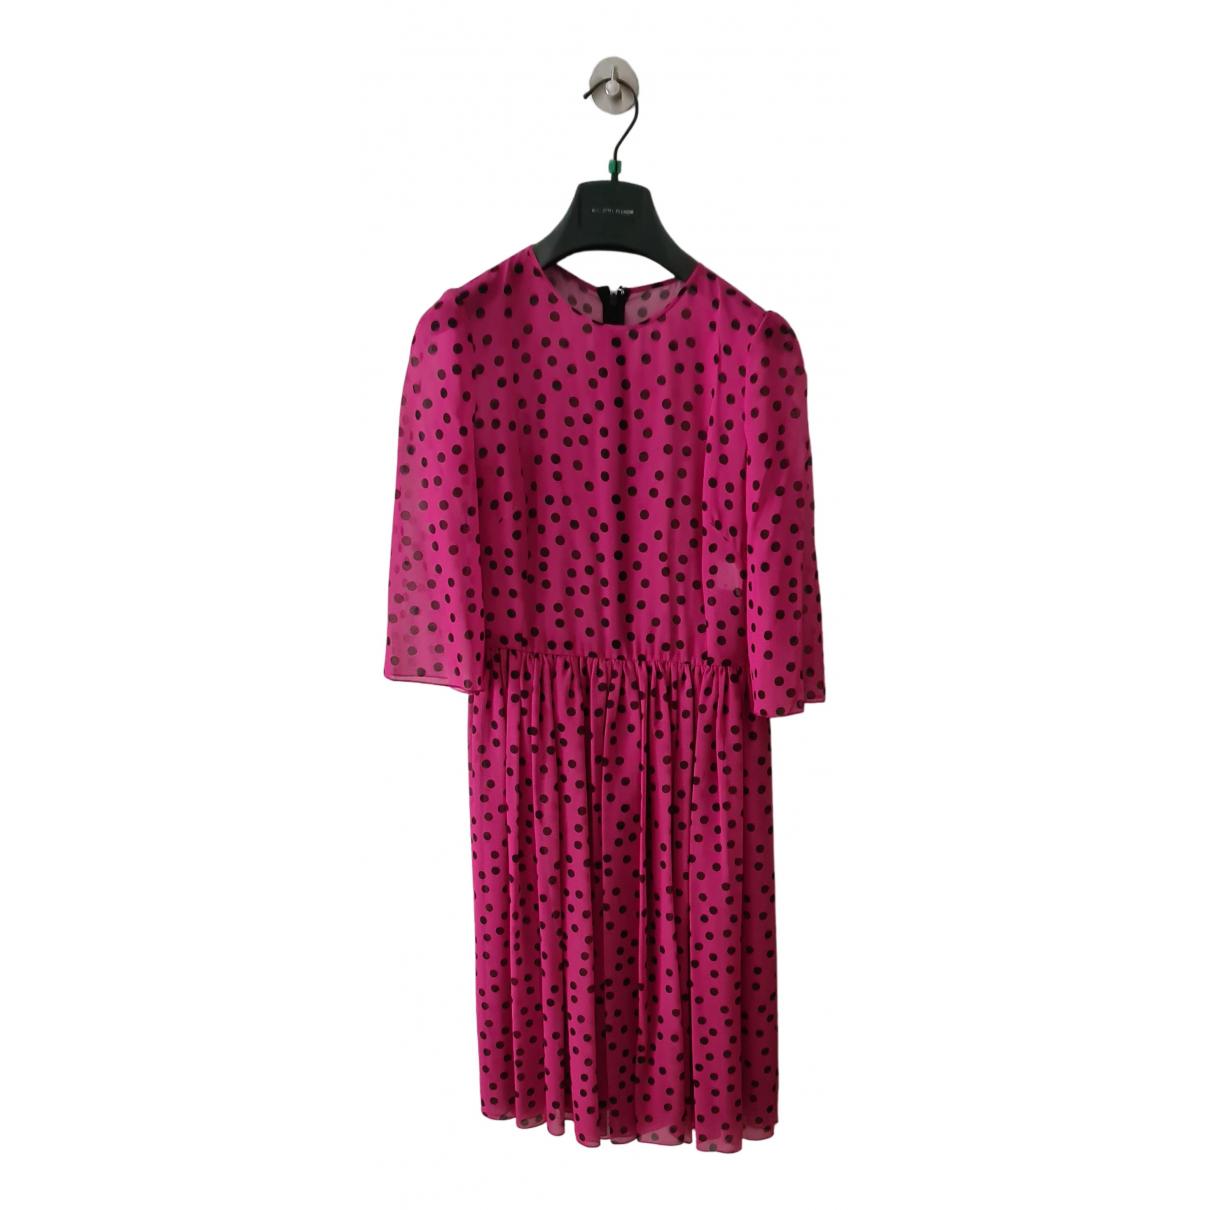 Dolce & Gabbana N Silk dress for Women 38 IT